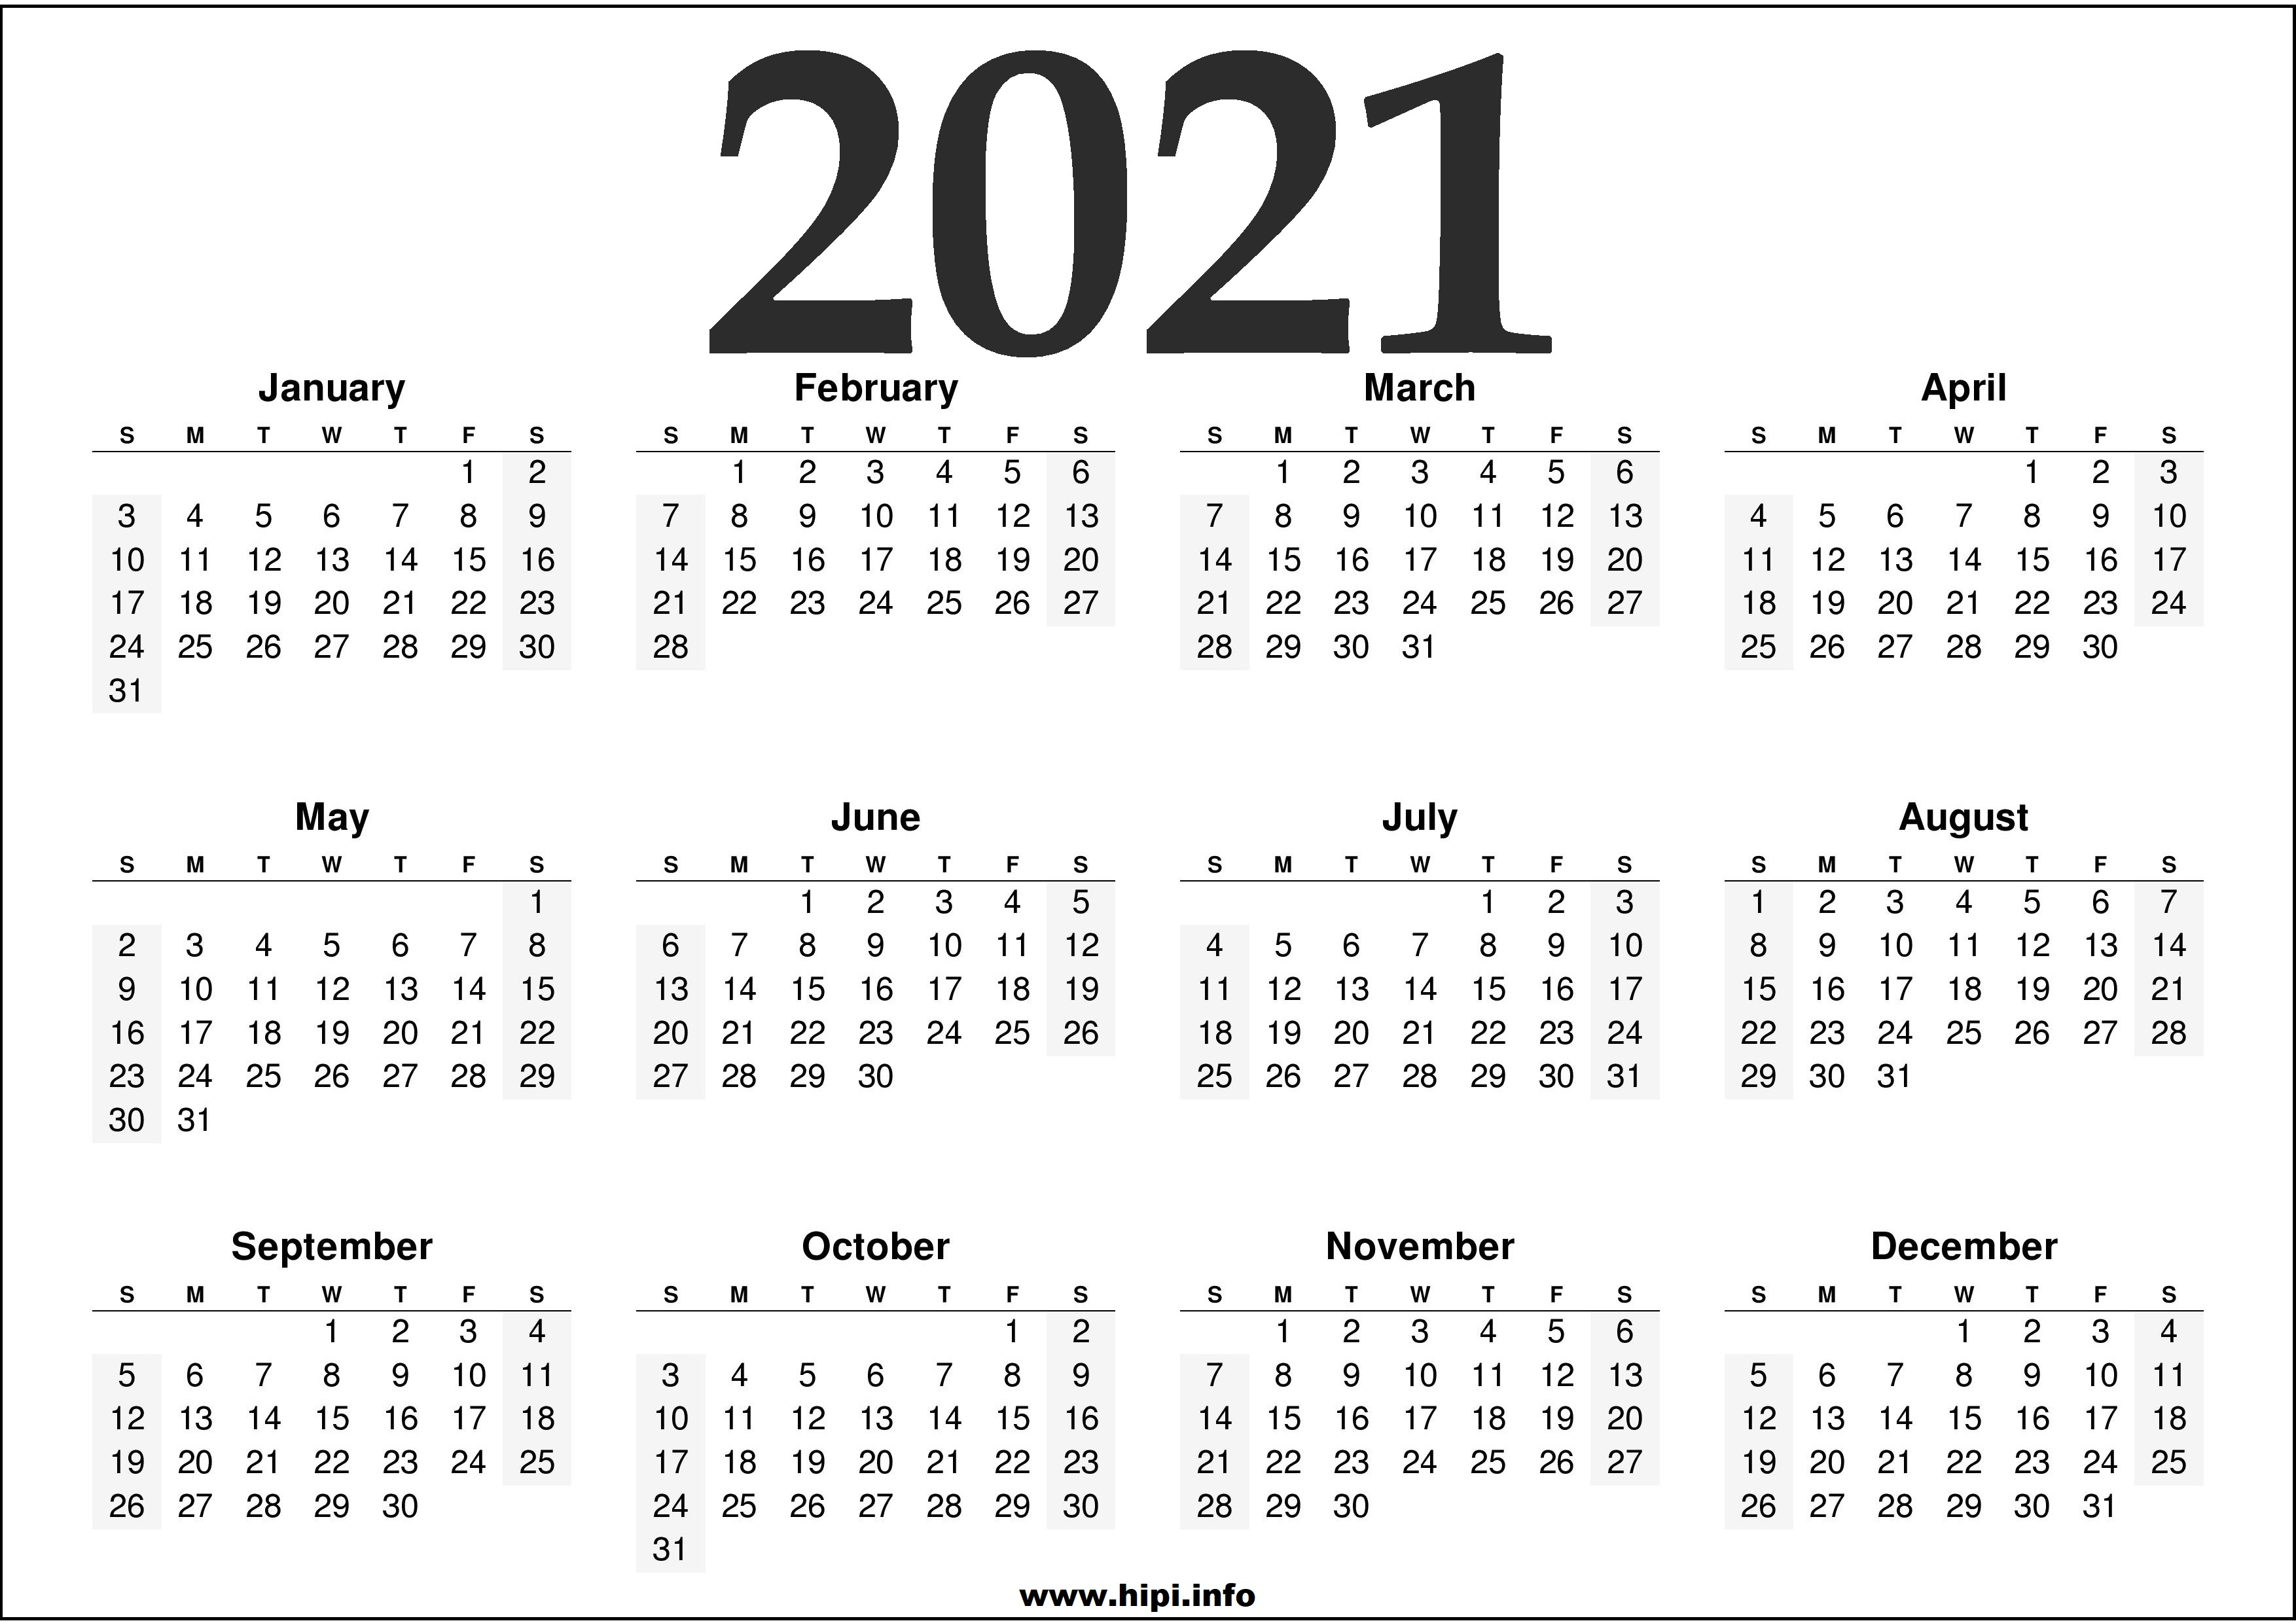 2021 Calendar Printable Free - Free Download - Hipi.info